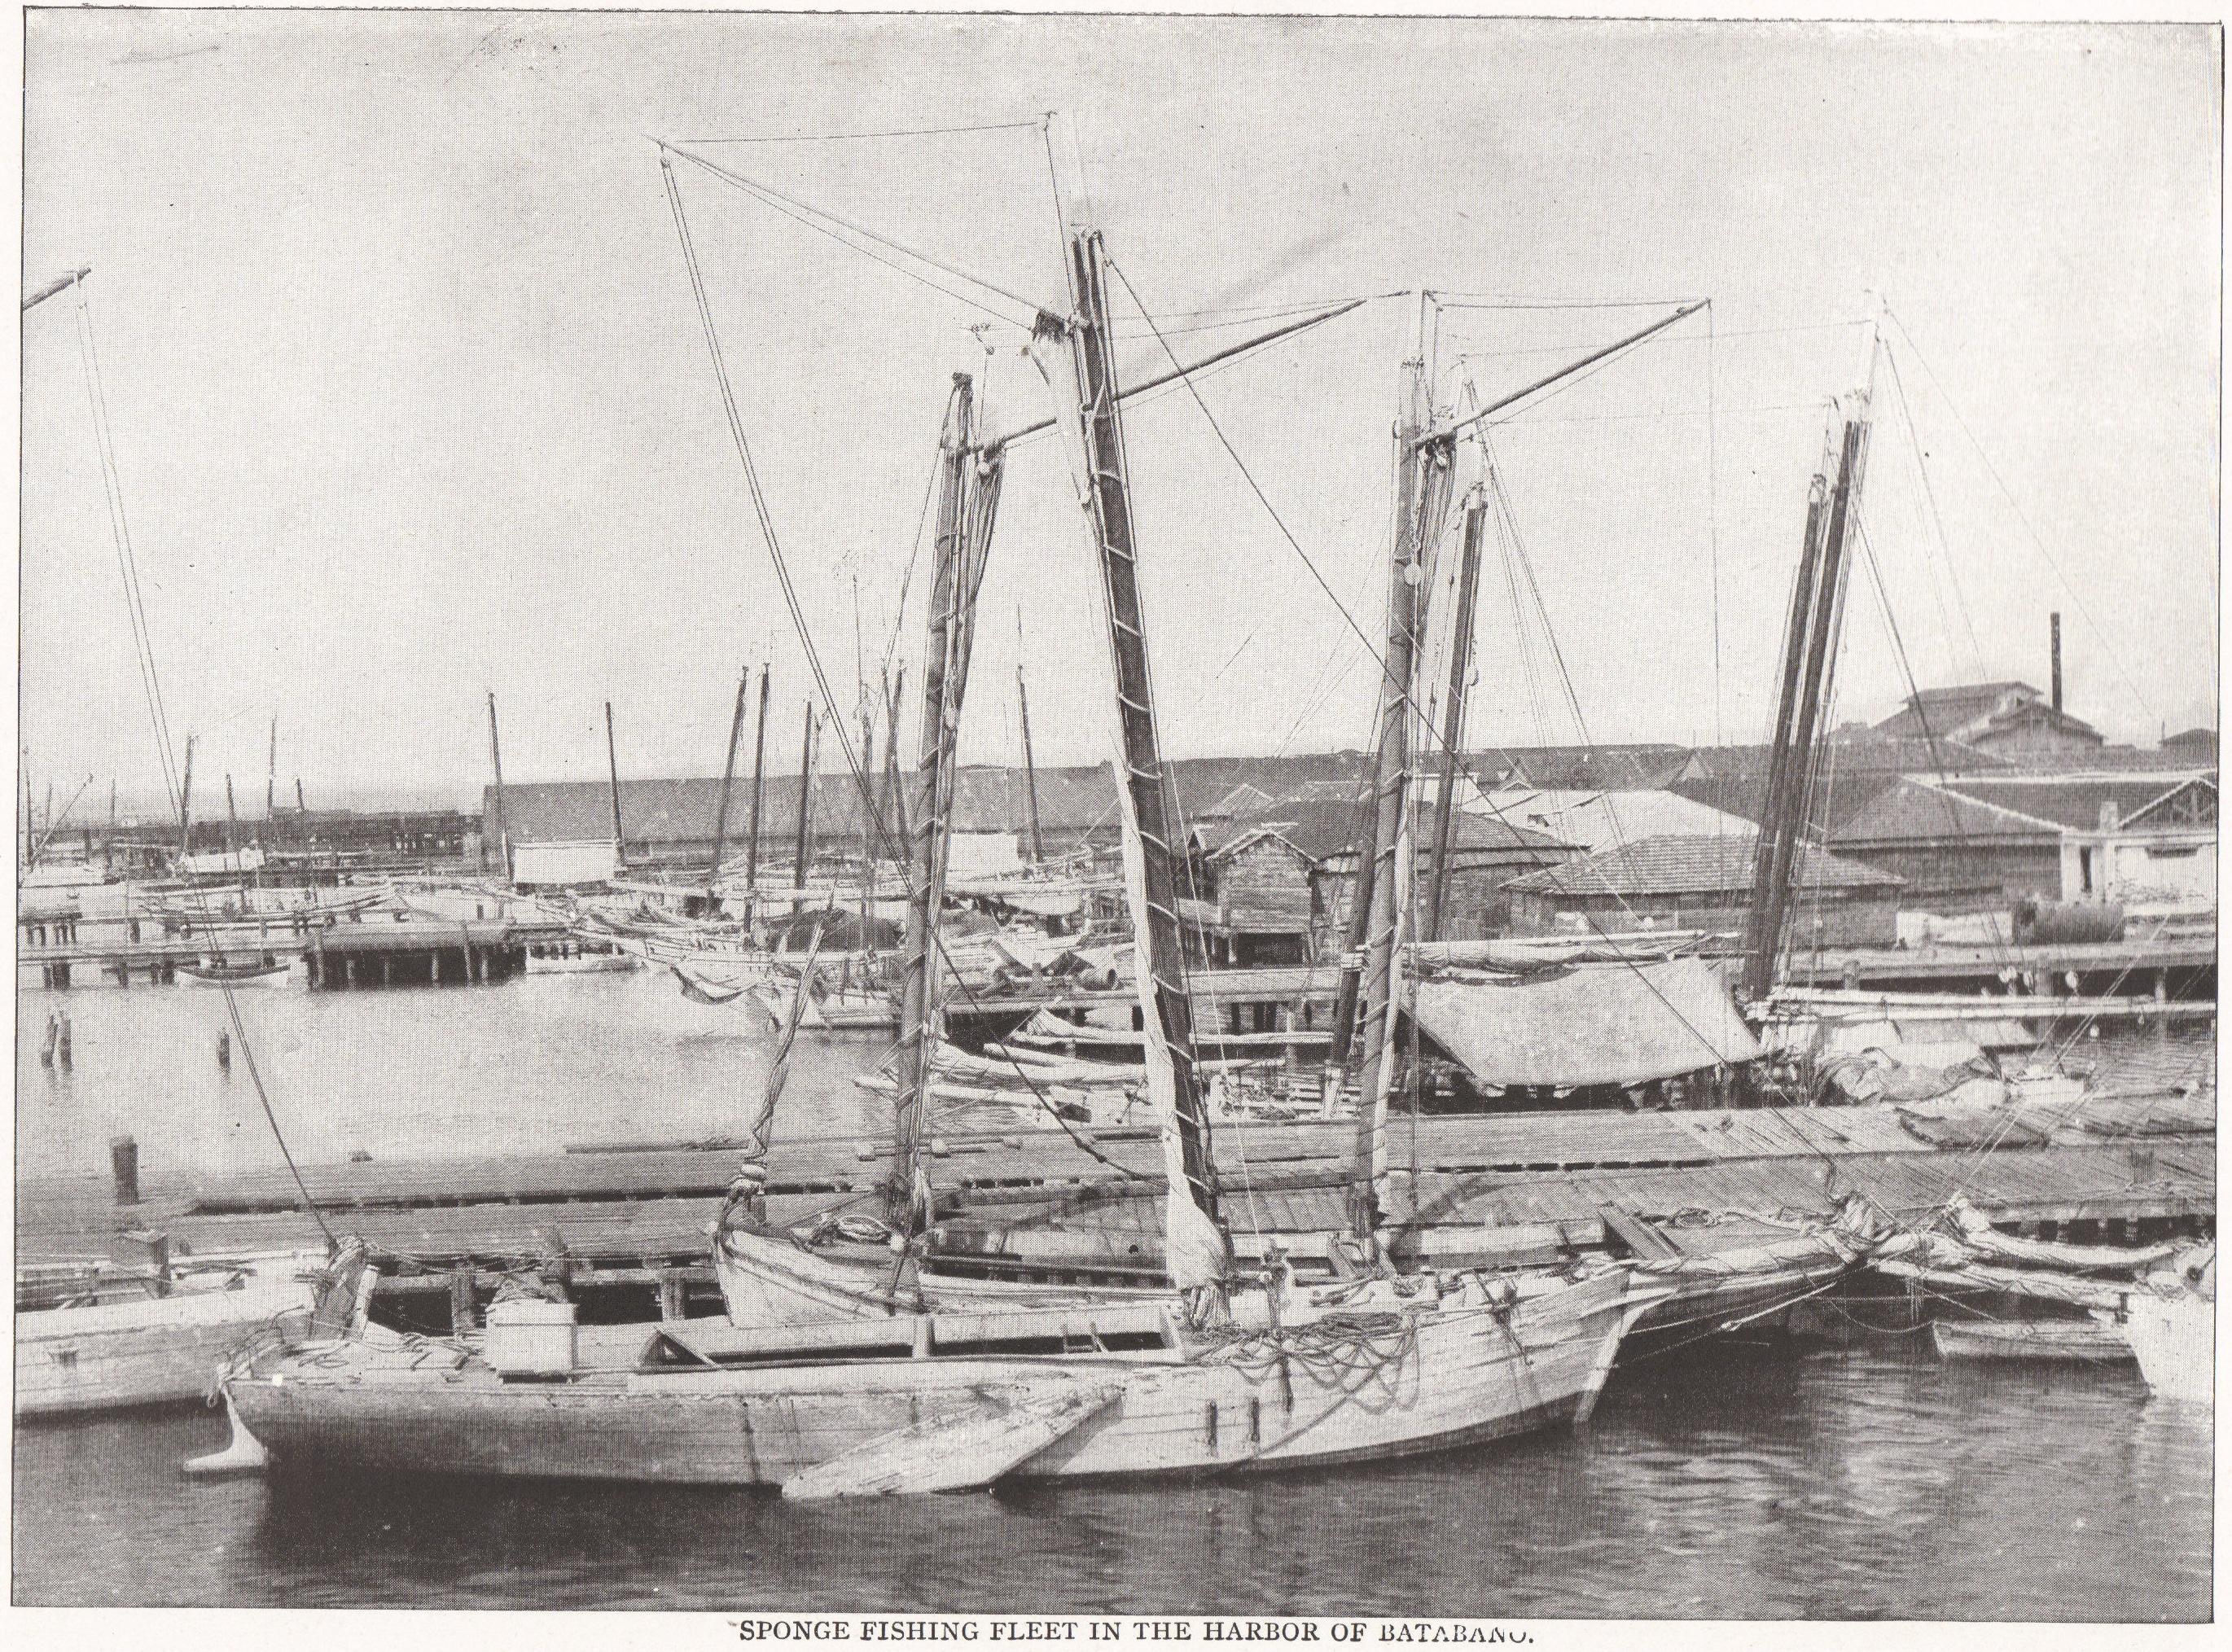 SPONGE FISHING FLEET IN THE HARBOR OF BATABANO (Cuba, 1898)